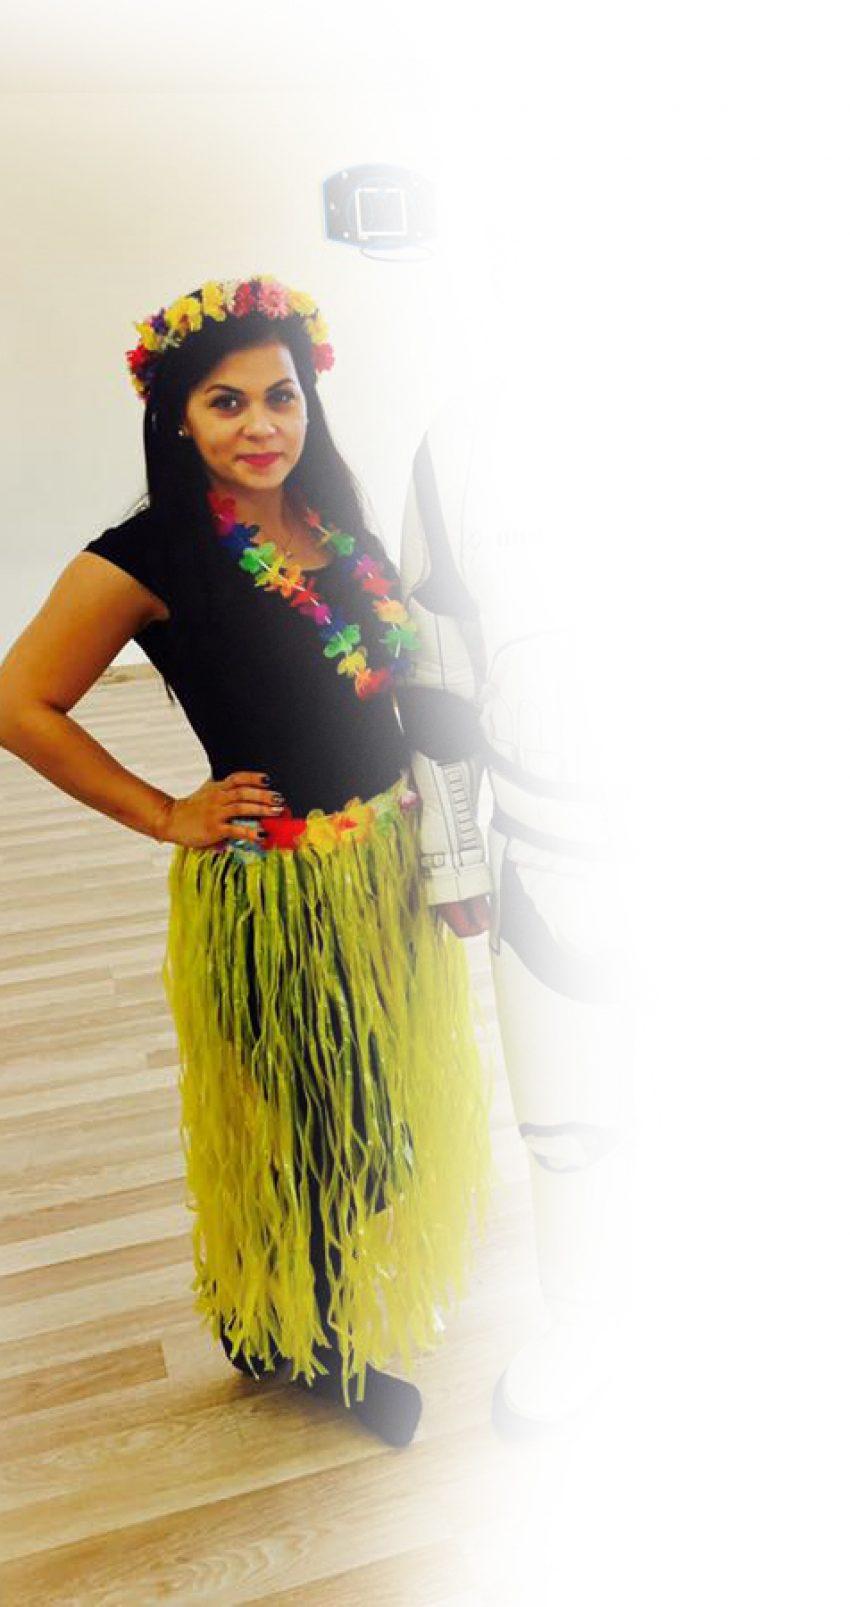 Fata Hawaiana - personaj improvizat la petreceri pentru copii in Iasi